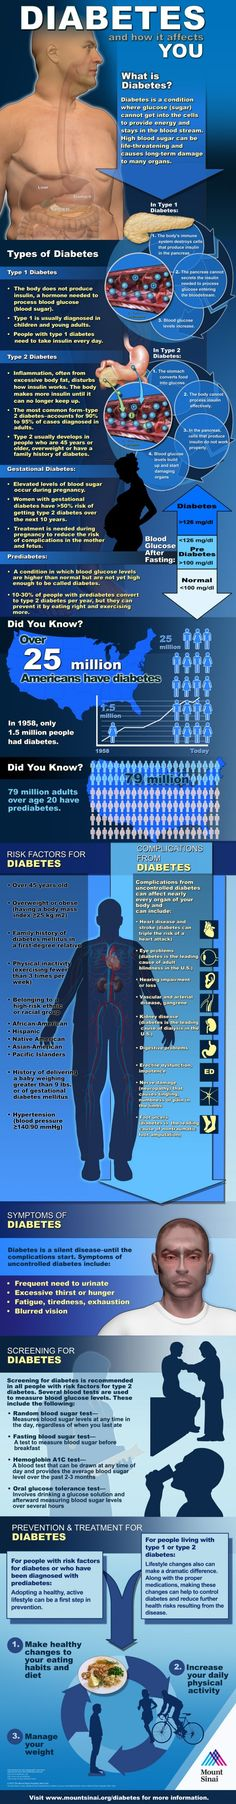 Diabetic Ketoacidosis Treatment #treatment_for_diabetes #treatment_for_diabetic_ketoacidosis #diabetic_ketoacidosis_treatment